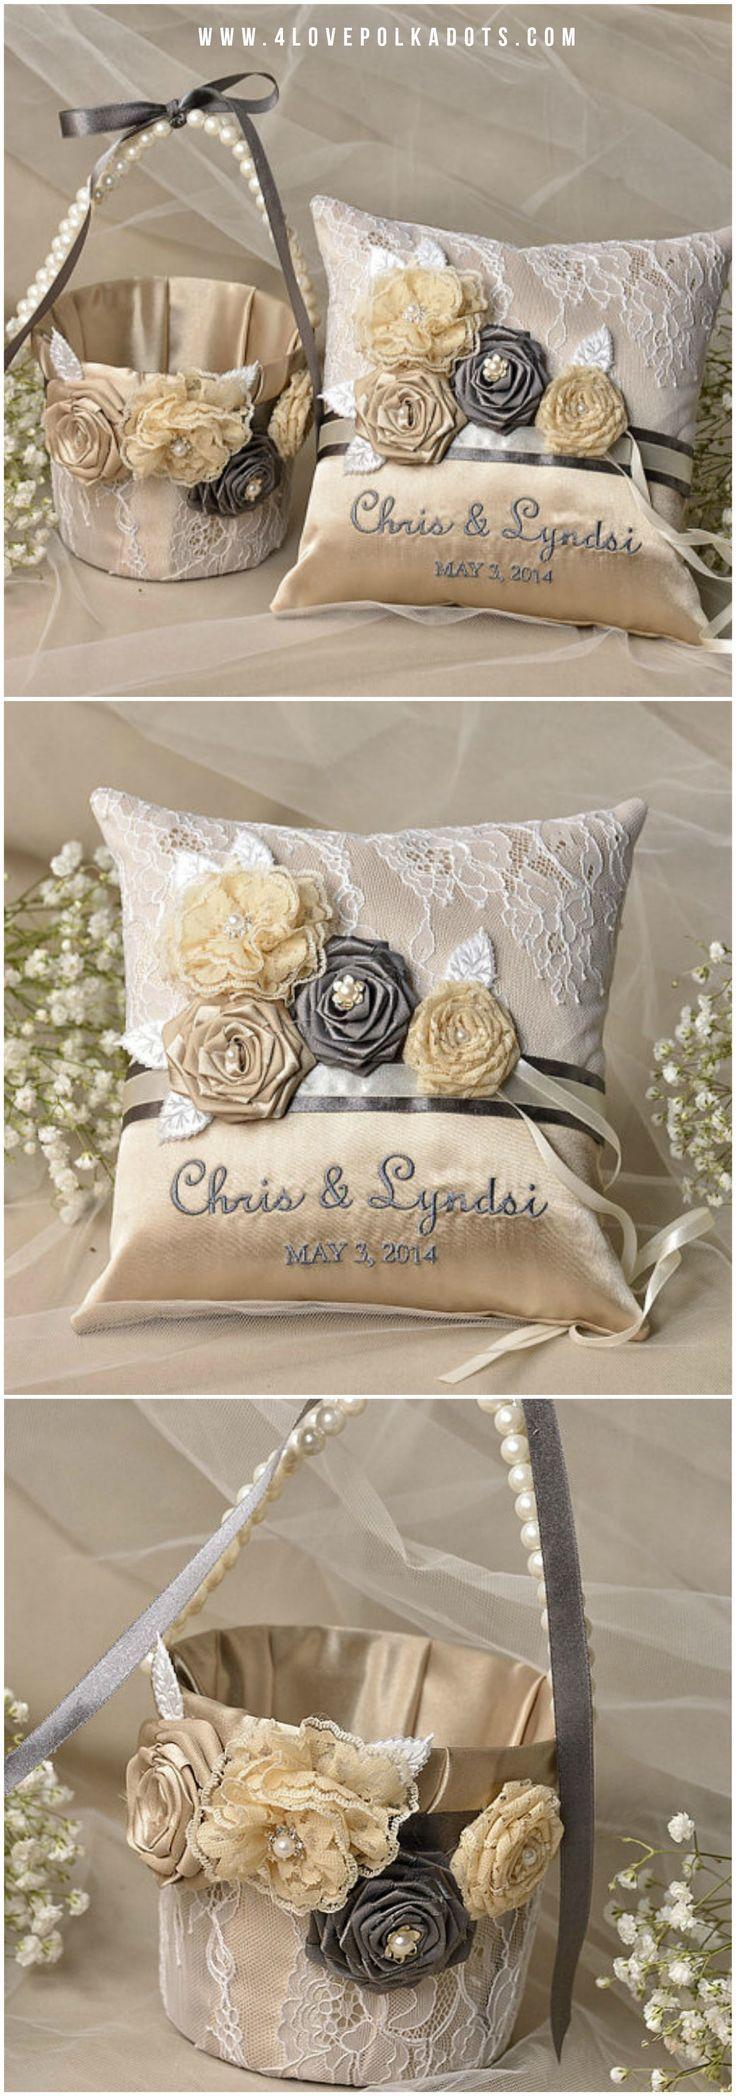 Champagne Wedding Satin Set - Wedding Ring Bearer Pillow & Basket #champagne #satin #handmade #goldwedding #weddingset #handmade #flowergirl #bearer